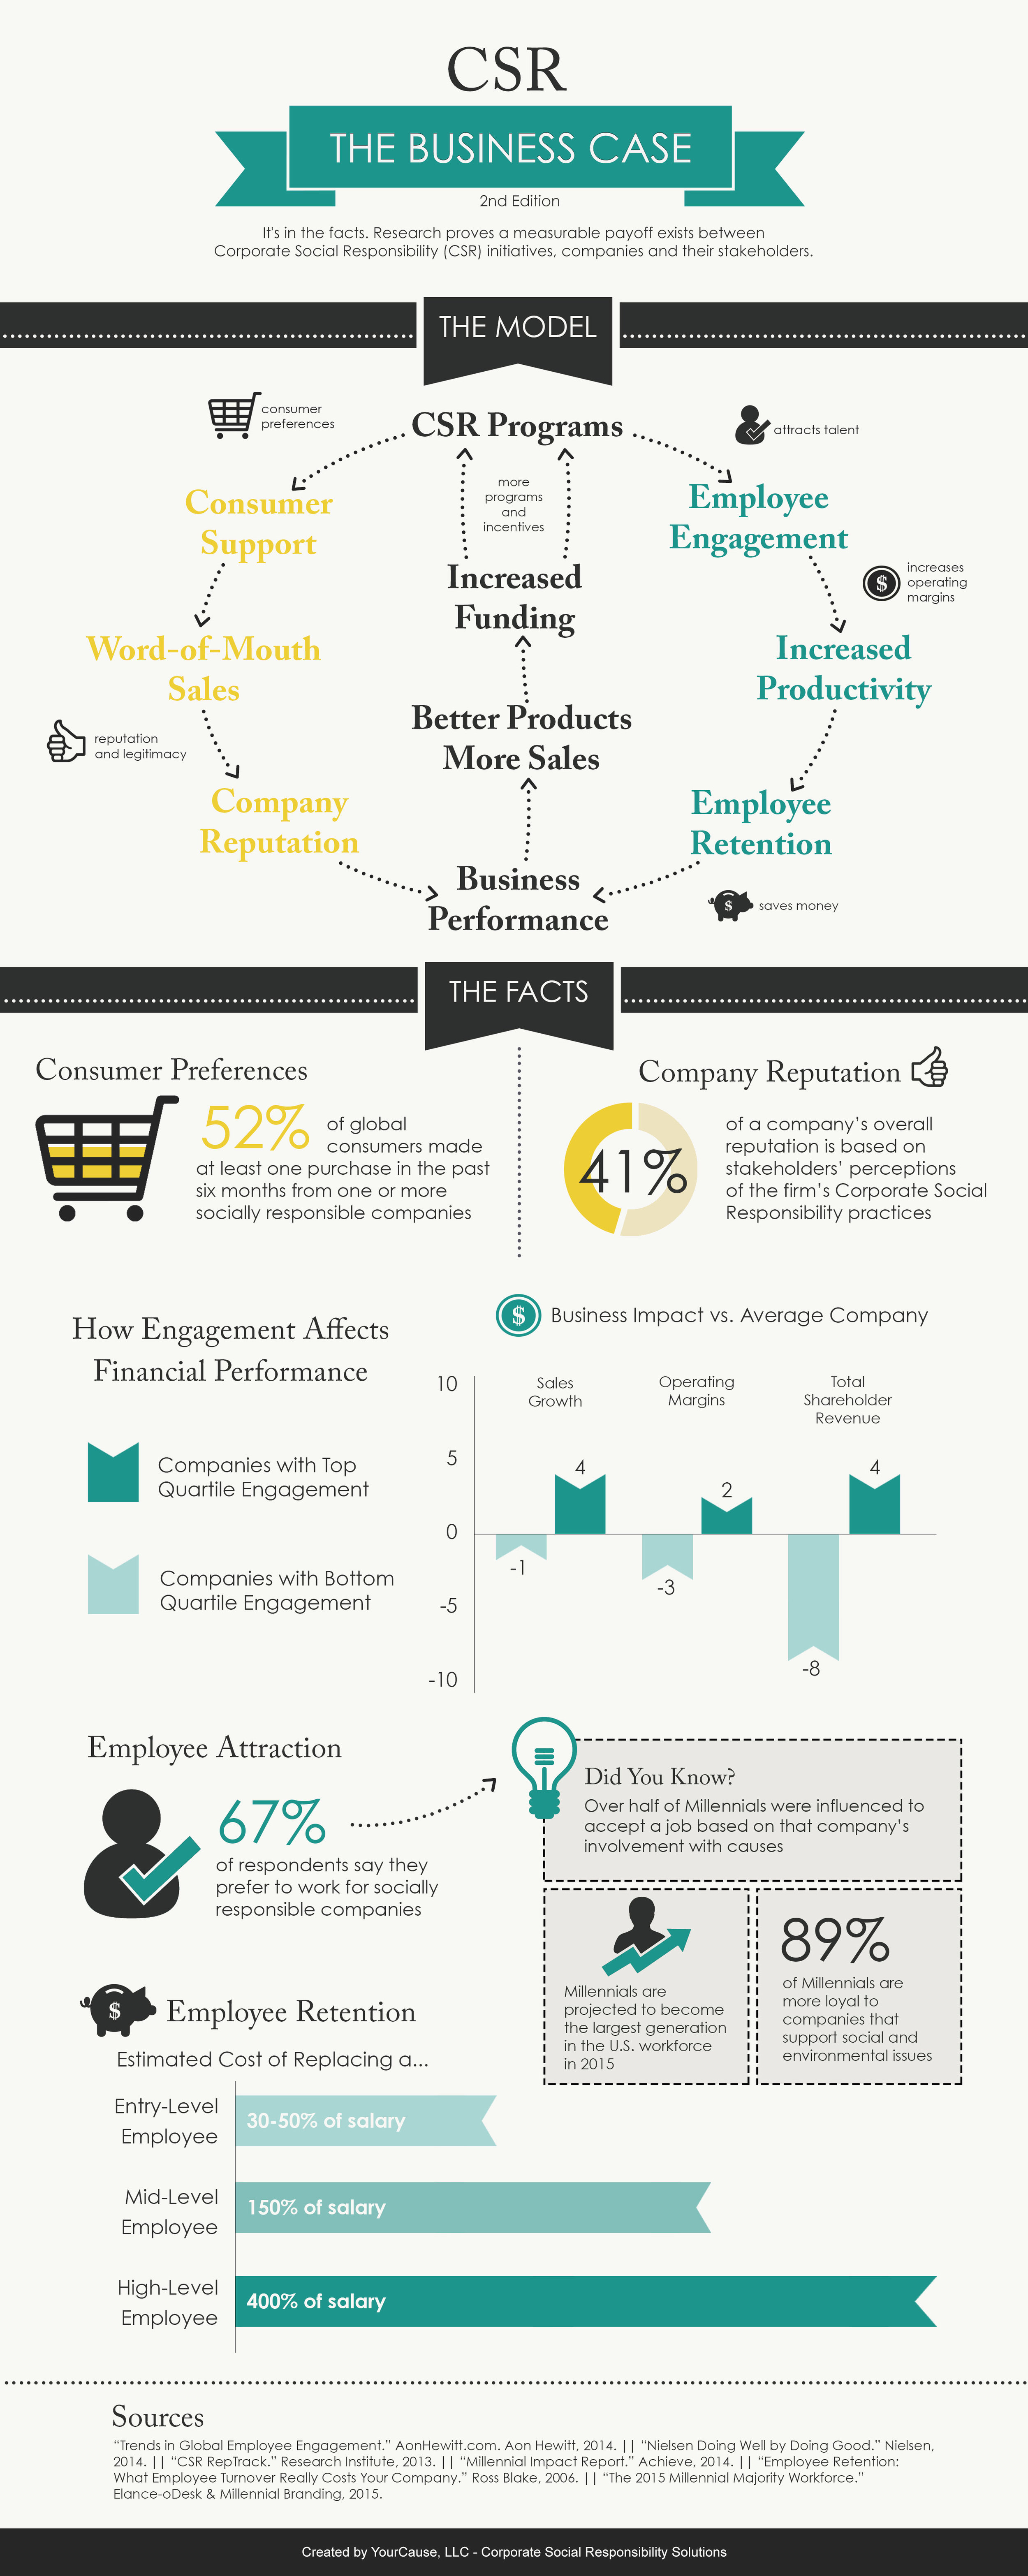 CSR The Business Case